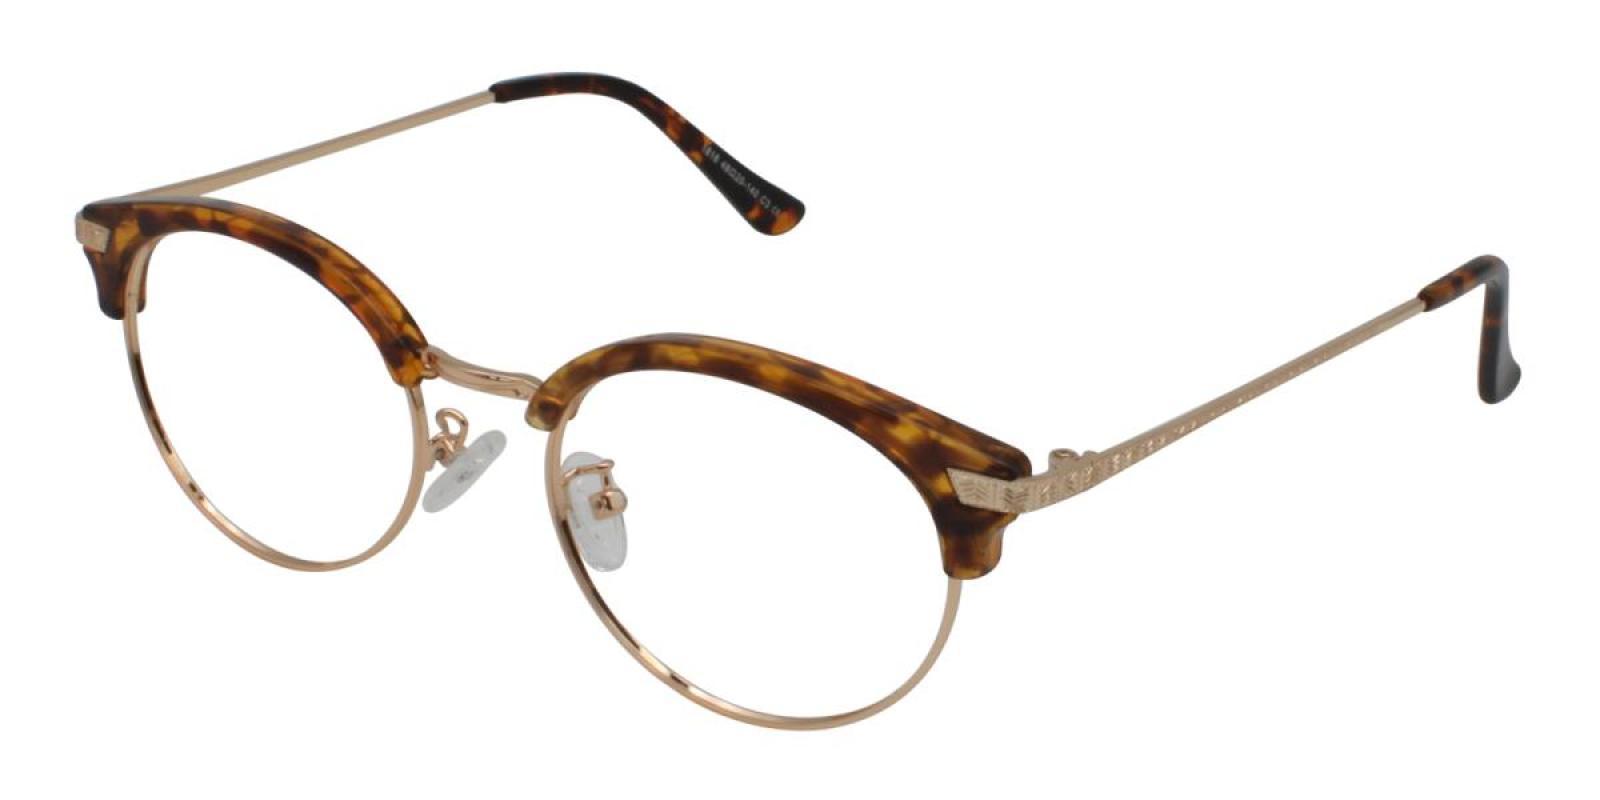 Atlandis-Leopard-Browline-Combination / Metal / TR-Eyeglasses-additional1